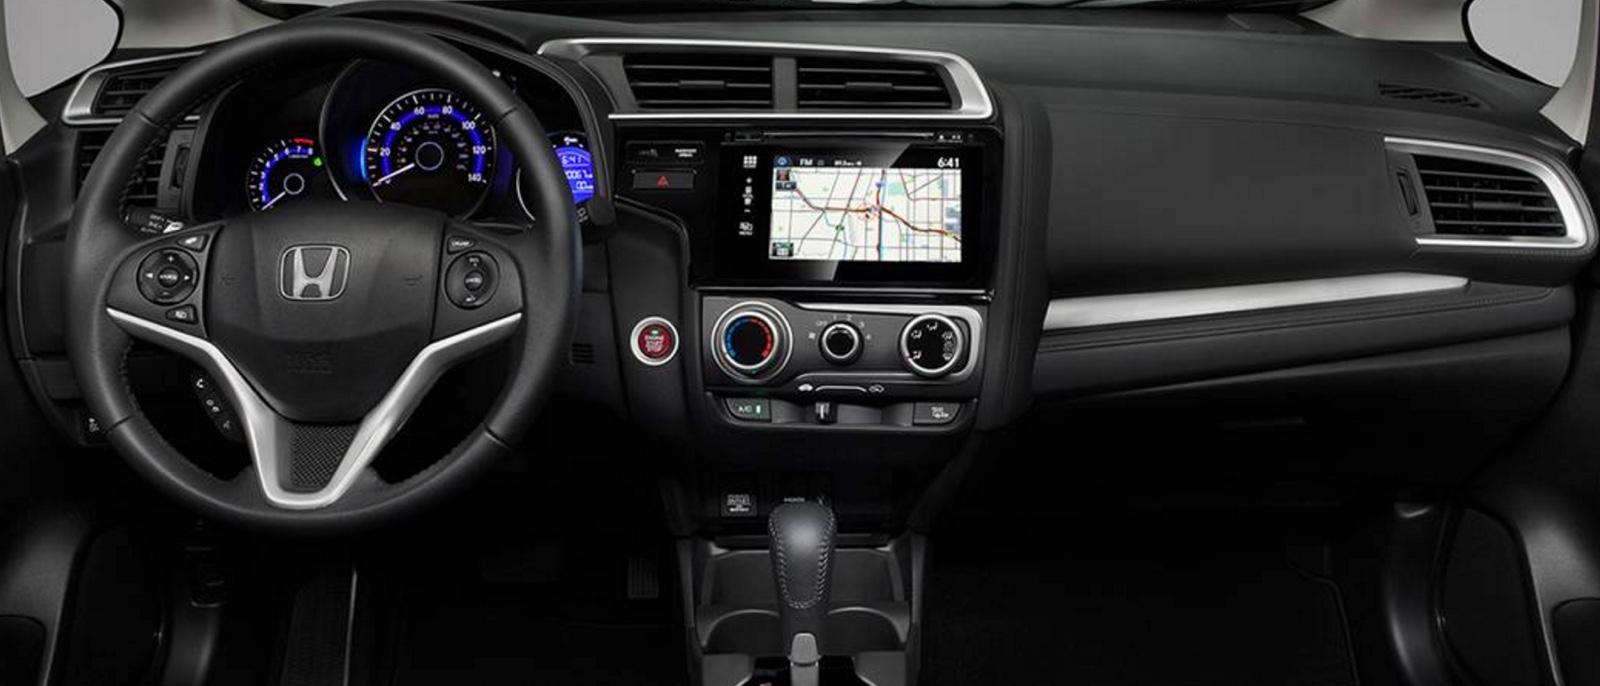 head honda ford drive the versus fit autonation fiesta vs to